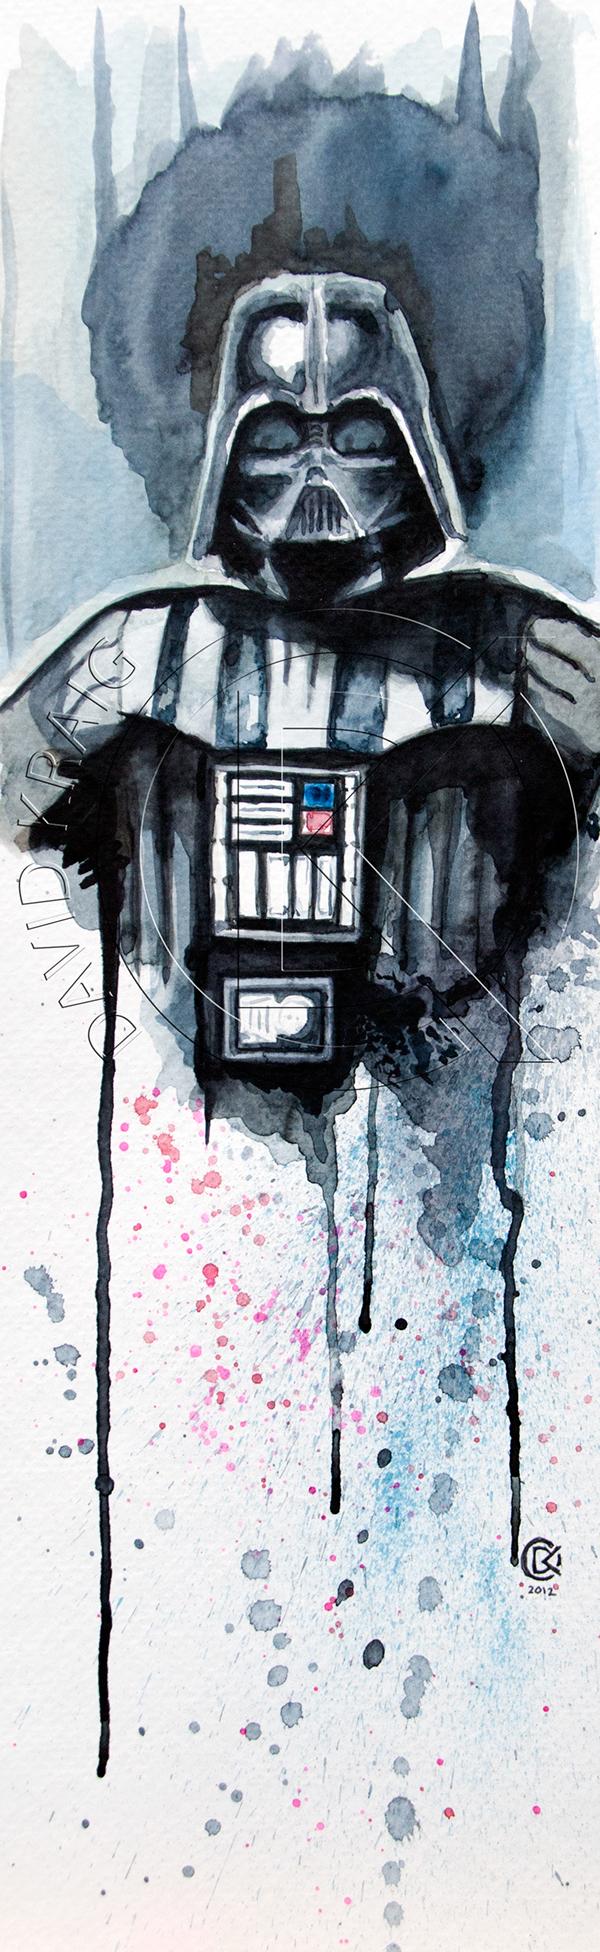 Darth Vader on Behance